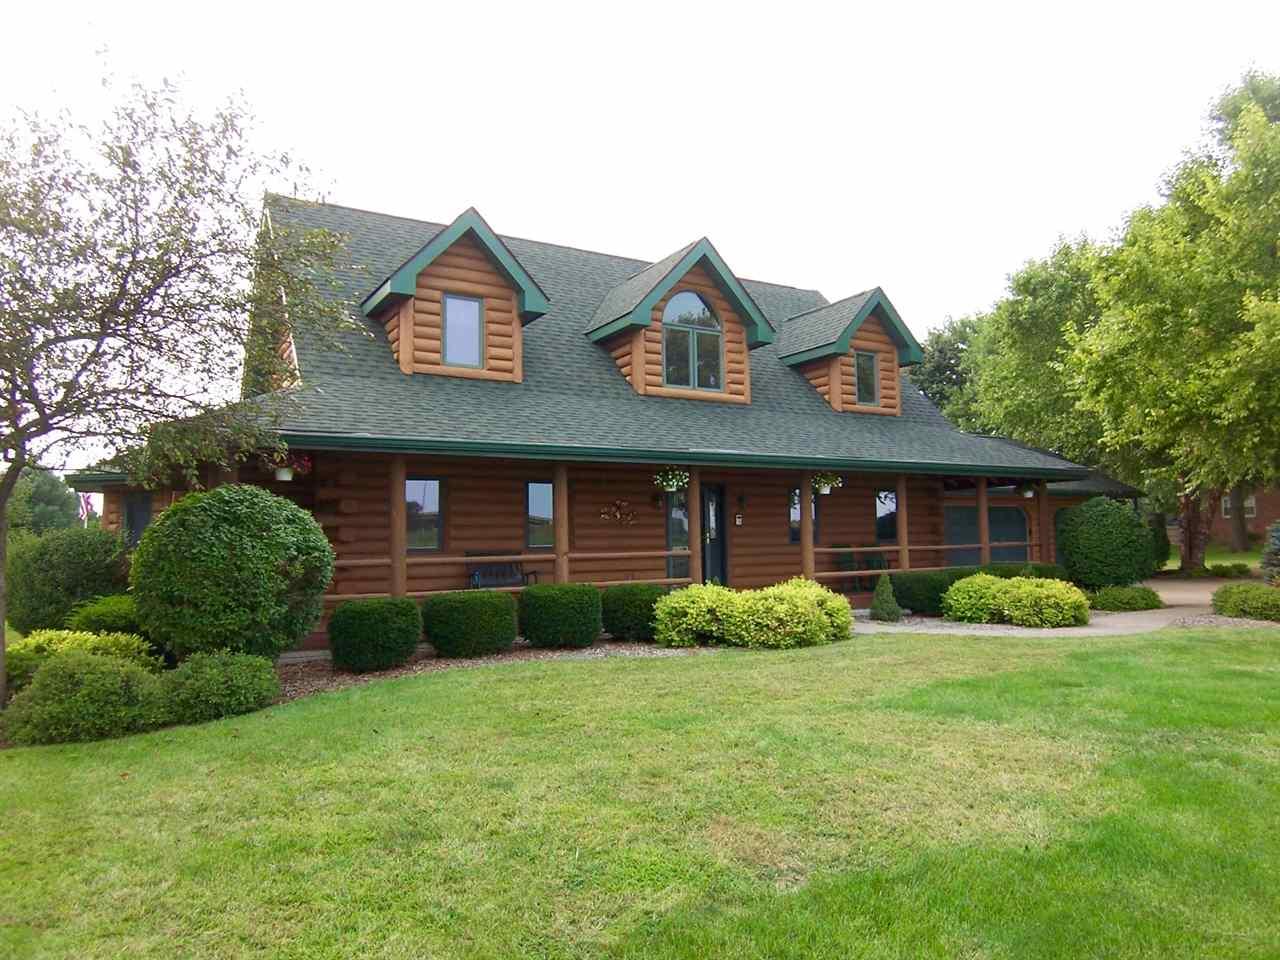 Real Estate for Sale, ListingId: 35167570, Davenport,IA52806